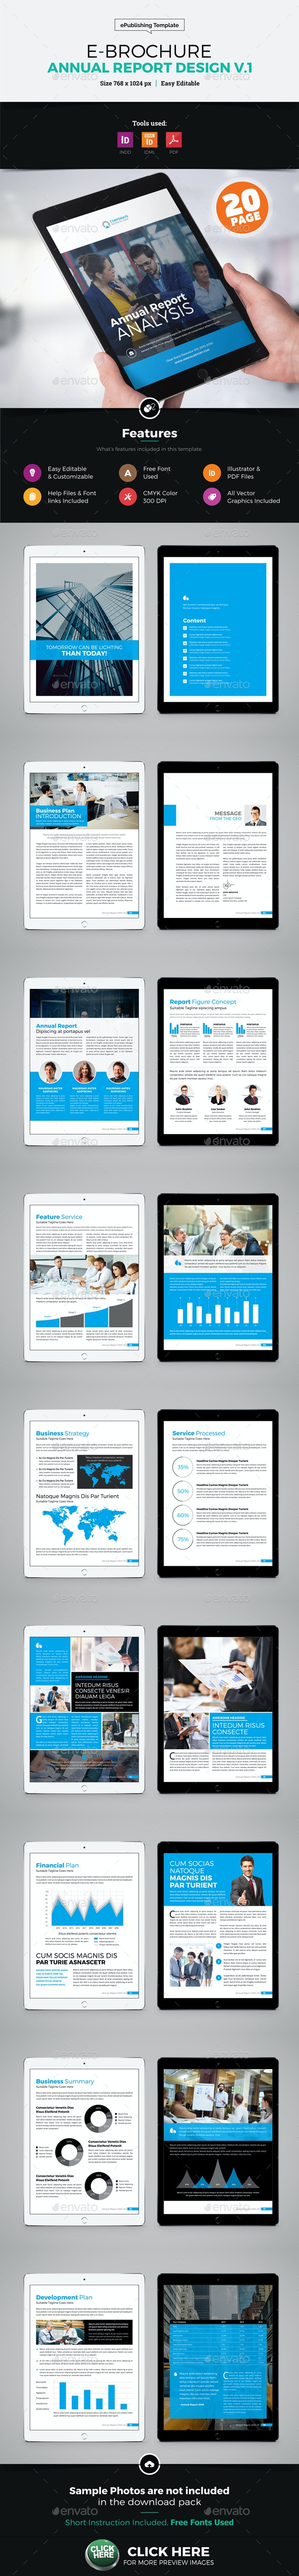 E-Brochure Annual Report Design - Digital Books ePublishing